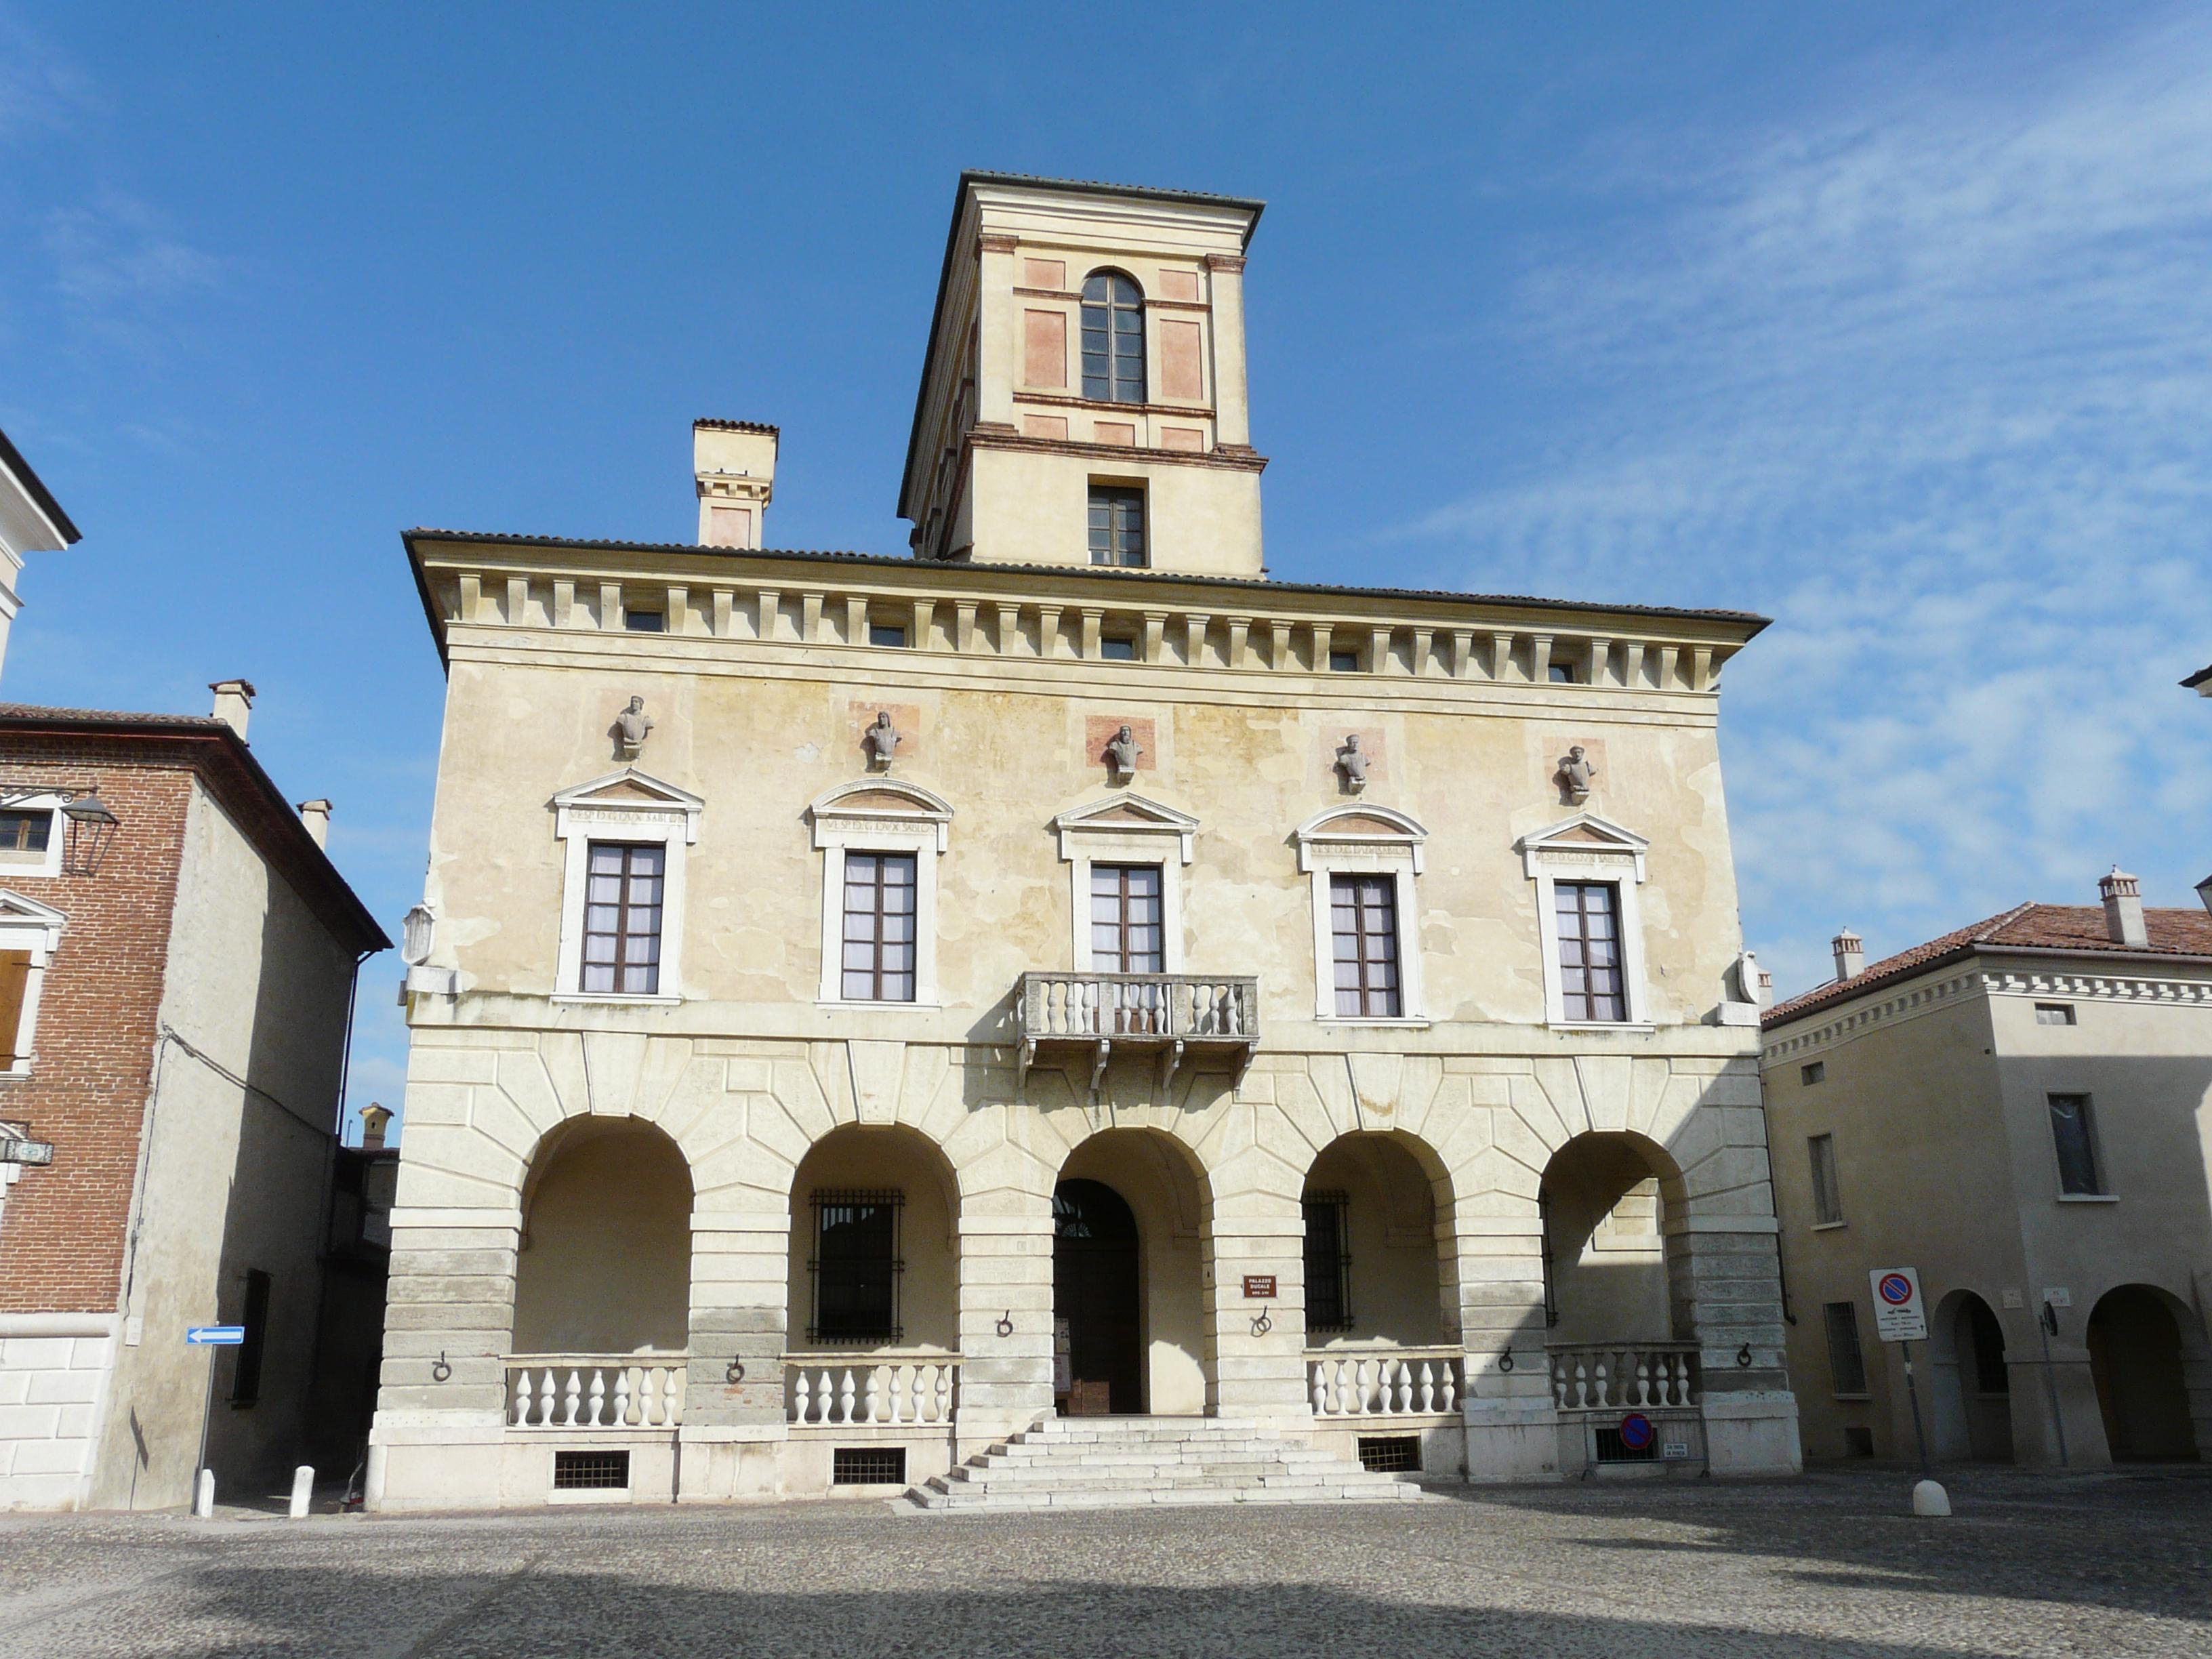 File:Sabbioneta-palazzo ducale2.jpg - Wikipedia